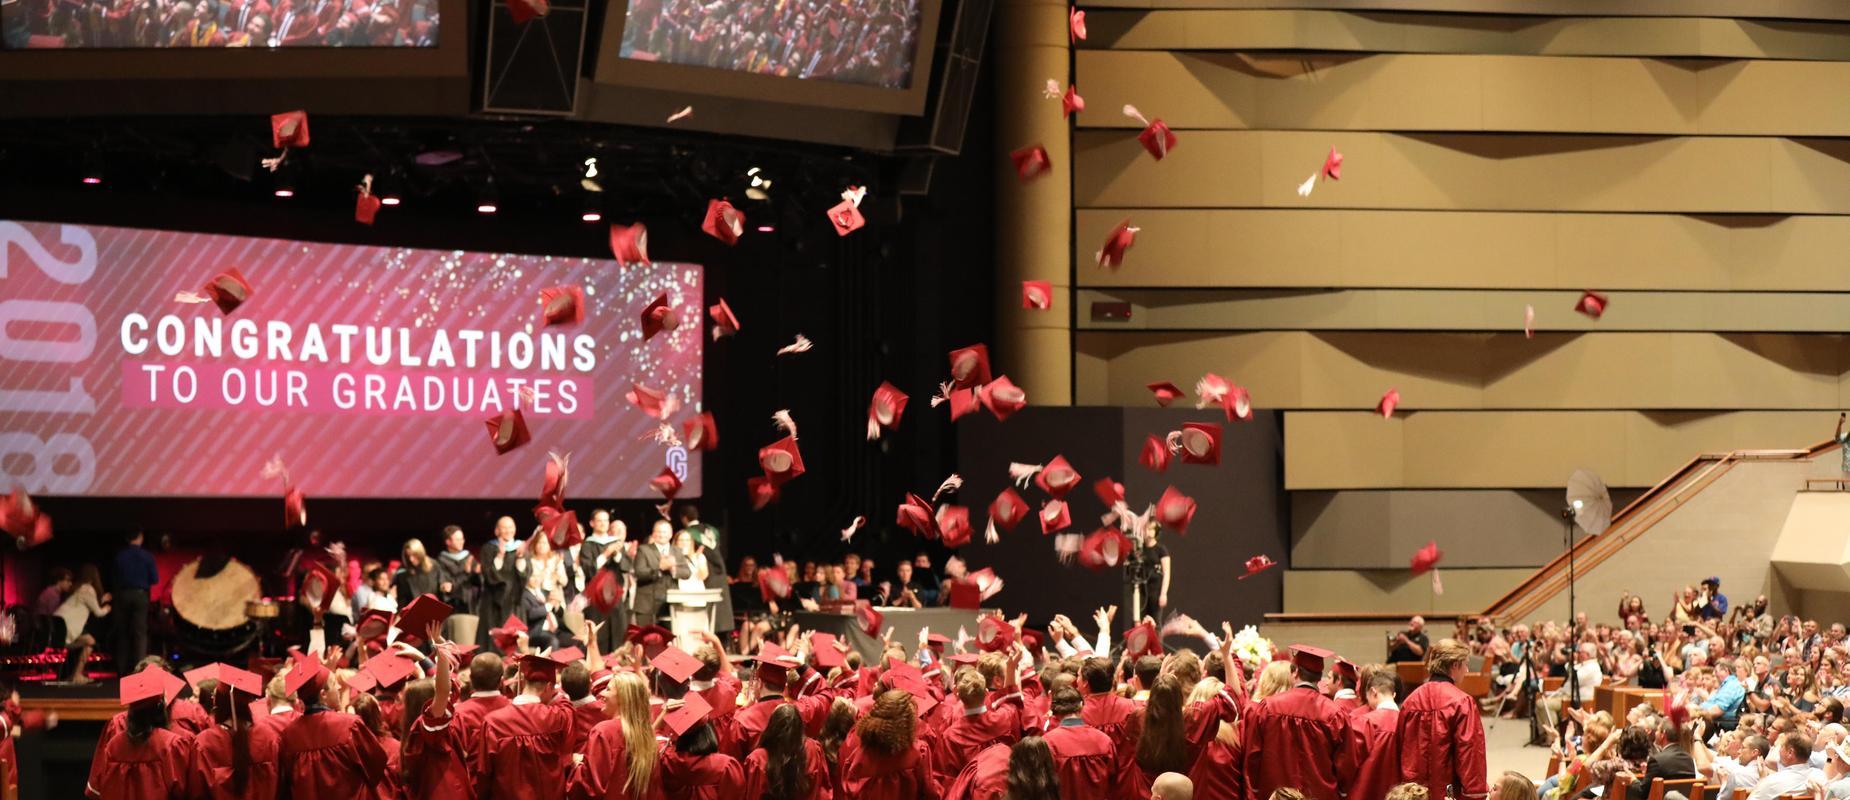 grads throw their maroon caps in the air at graduation